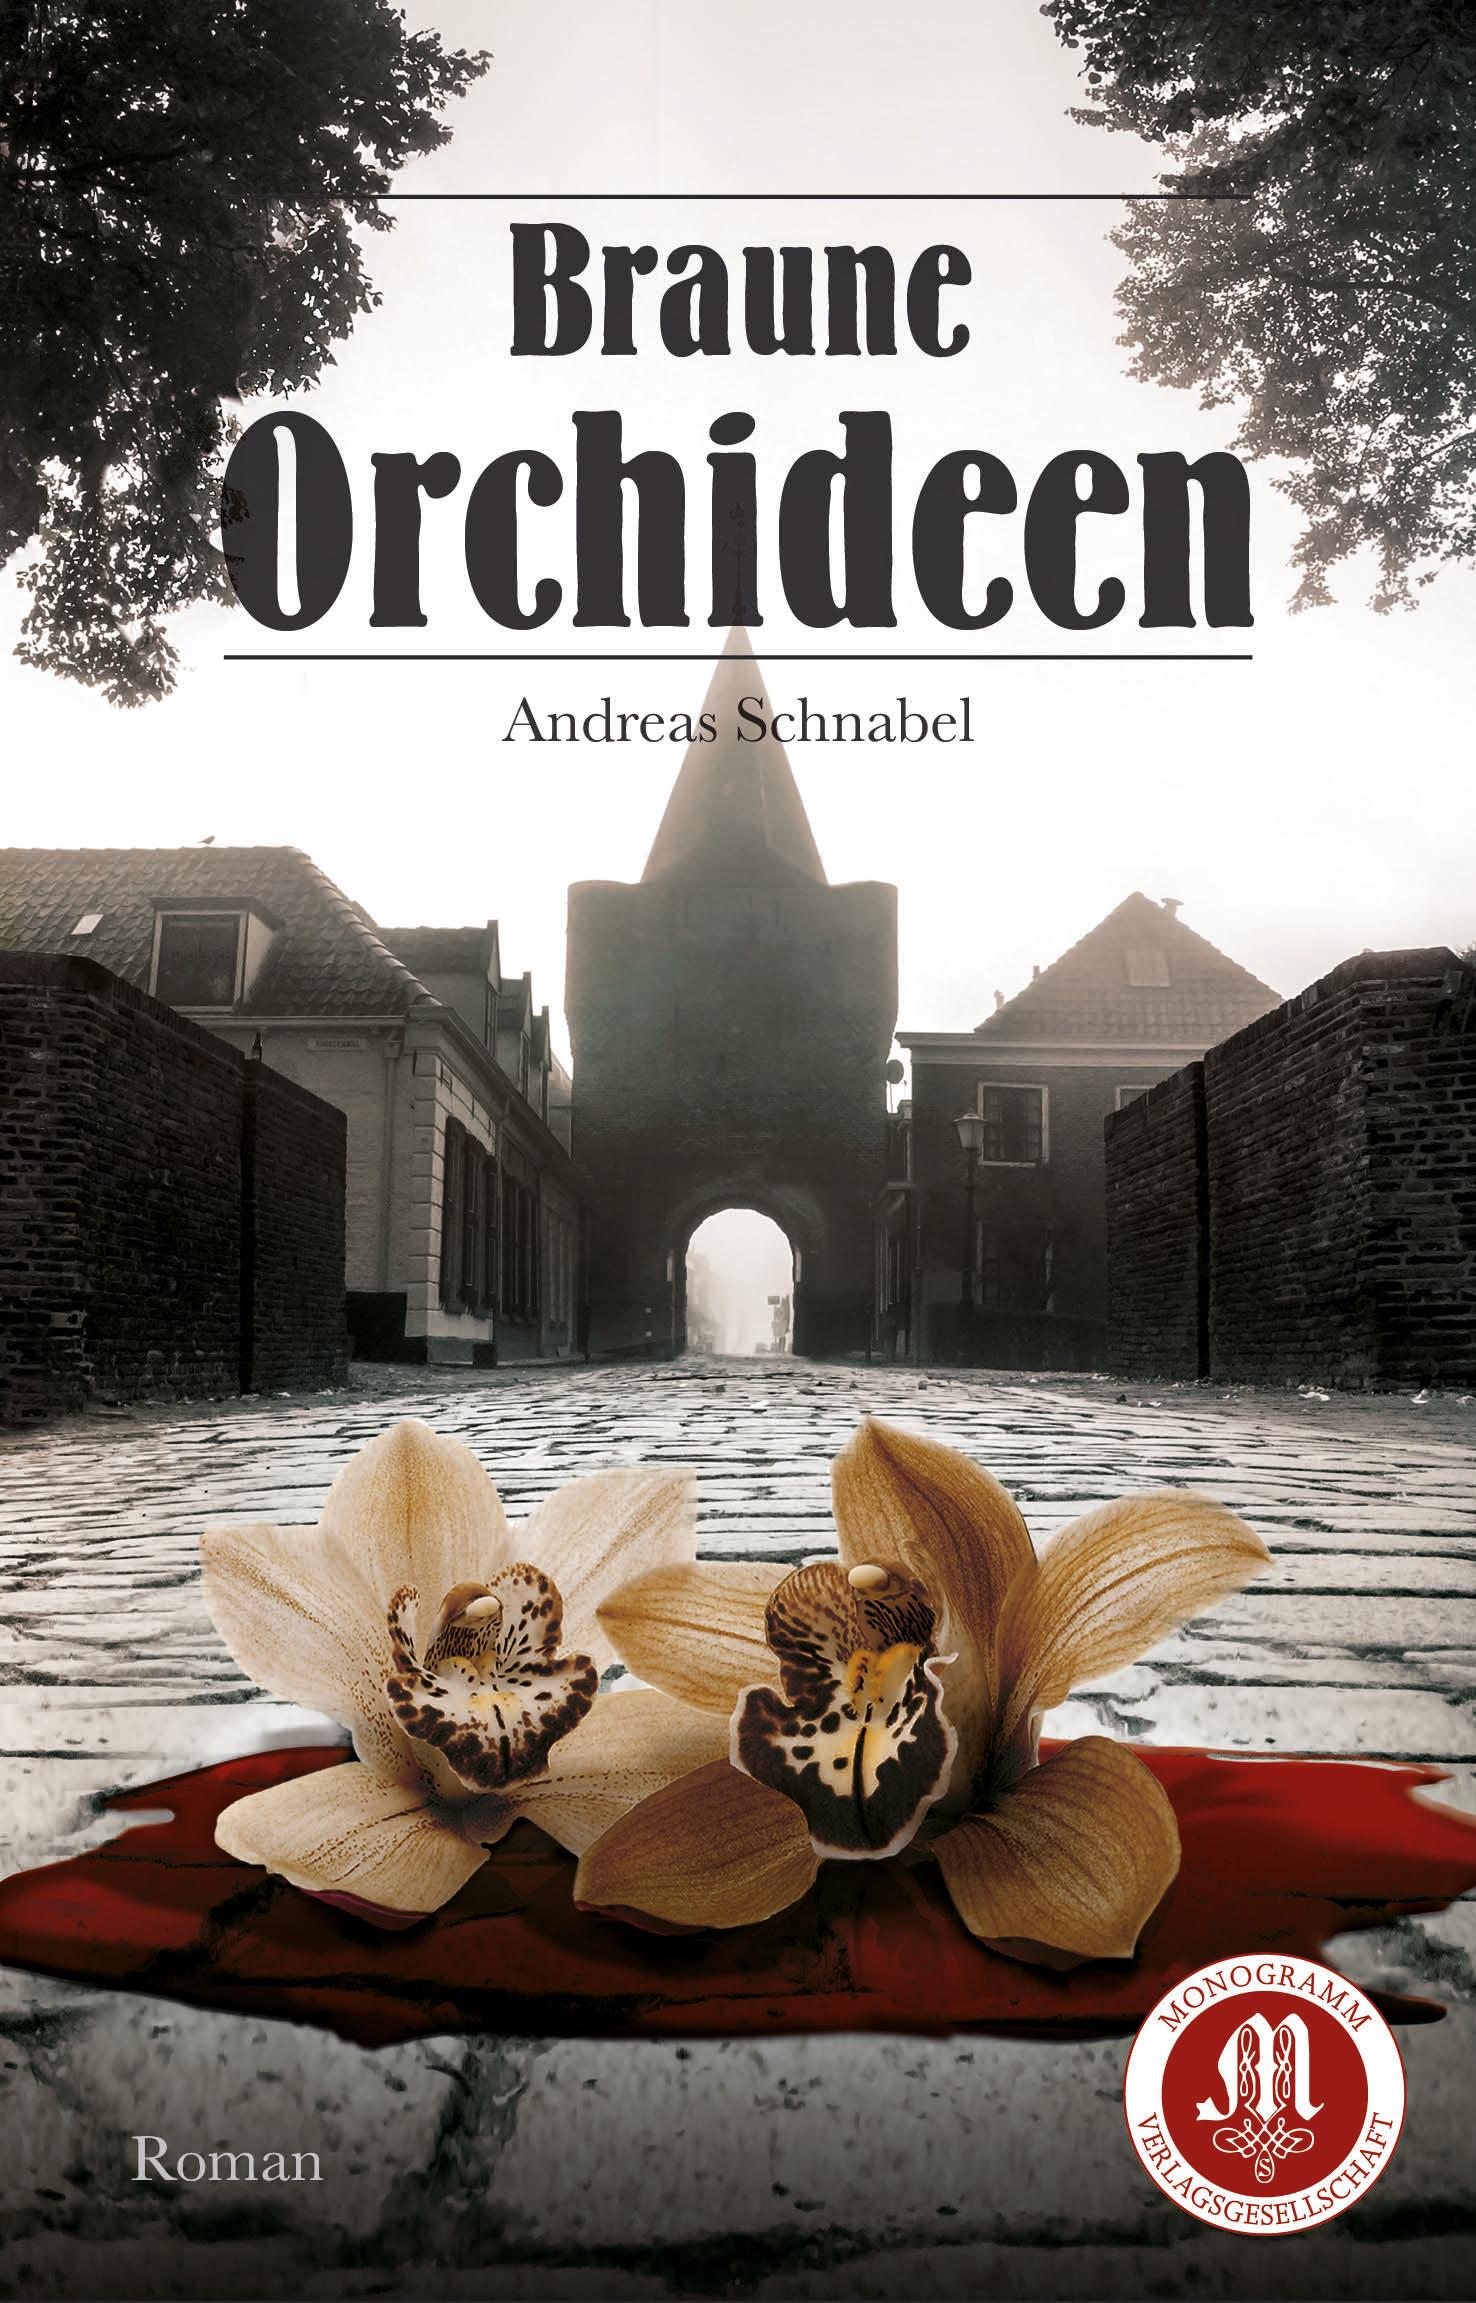 Braune Orchideen Andreas Schnabel